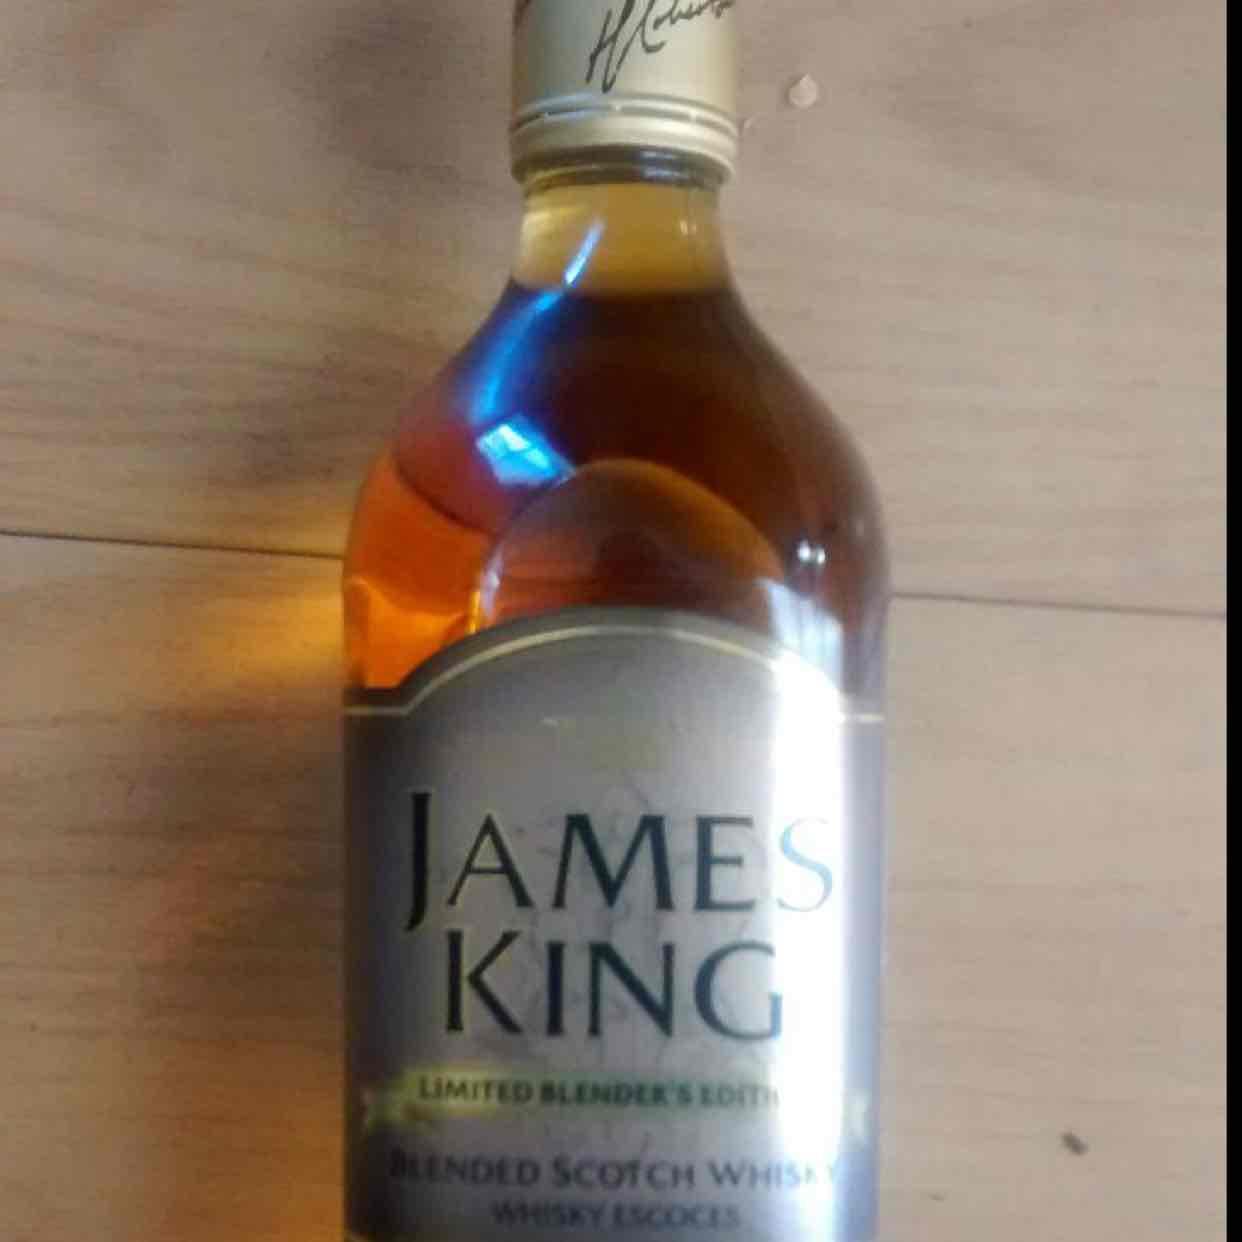 Walmart tienda física: whisky james king limited edition 41.02